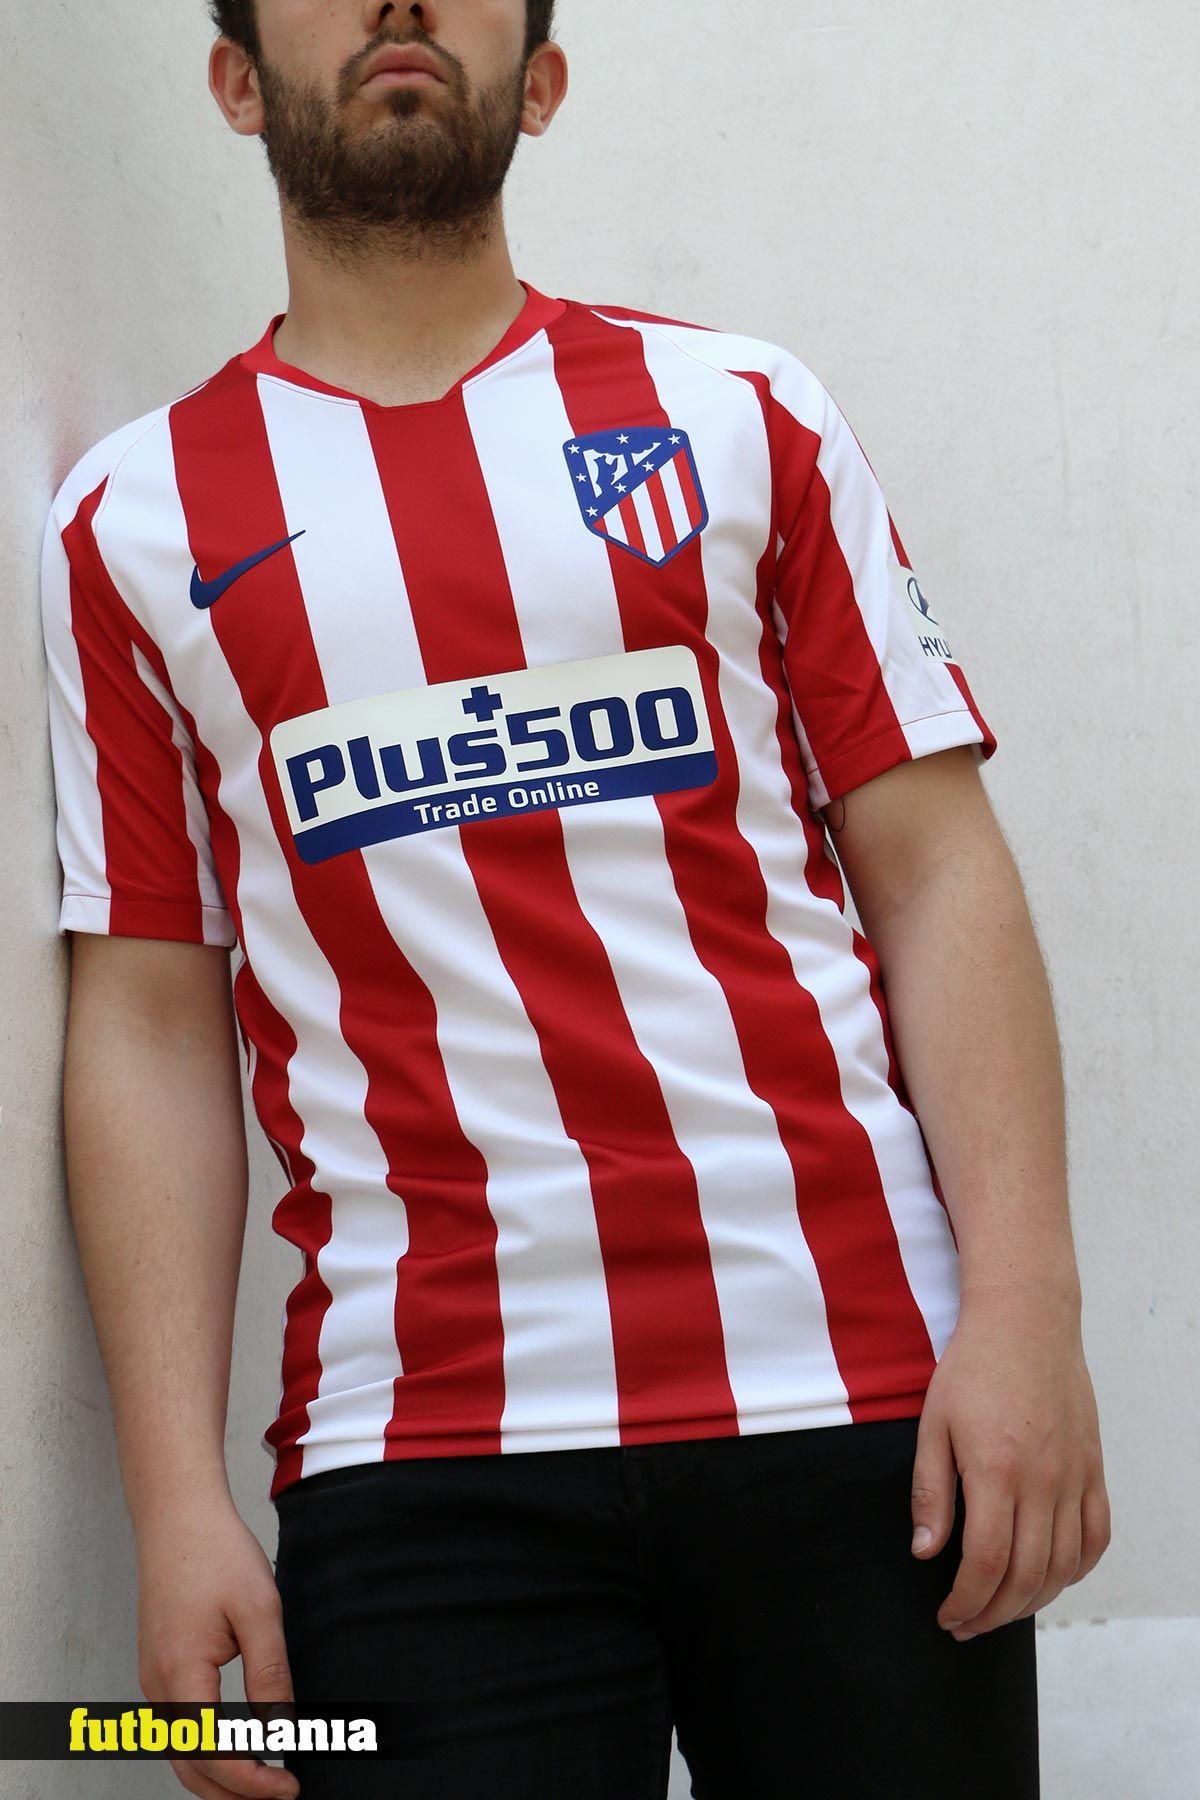 Tratado Persona australiana Farmacología  Camiseta Atlético de Madrid 2019 | Atletico de madri, Nike, Camiseta